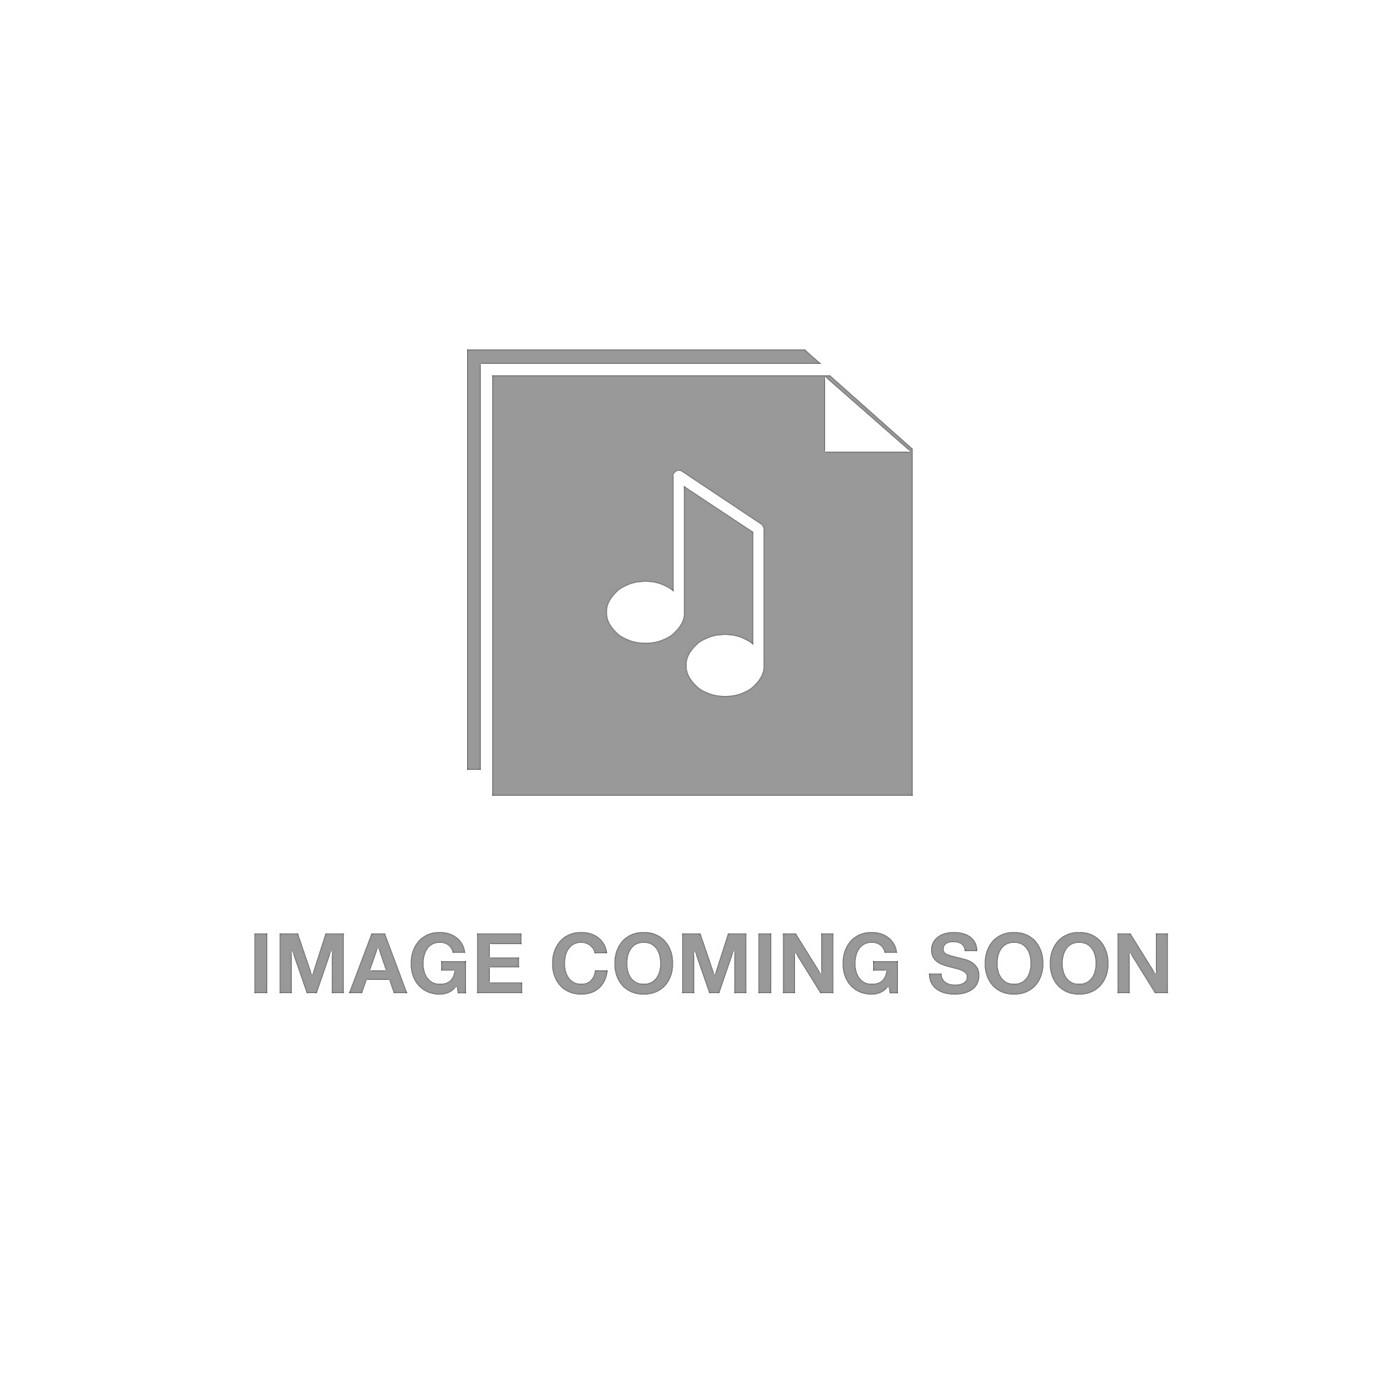 Hal Leonard FastTrack Drum Method 1 (Book/Online Audio) thumbnail